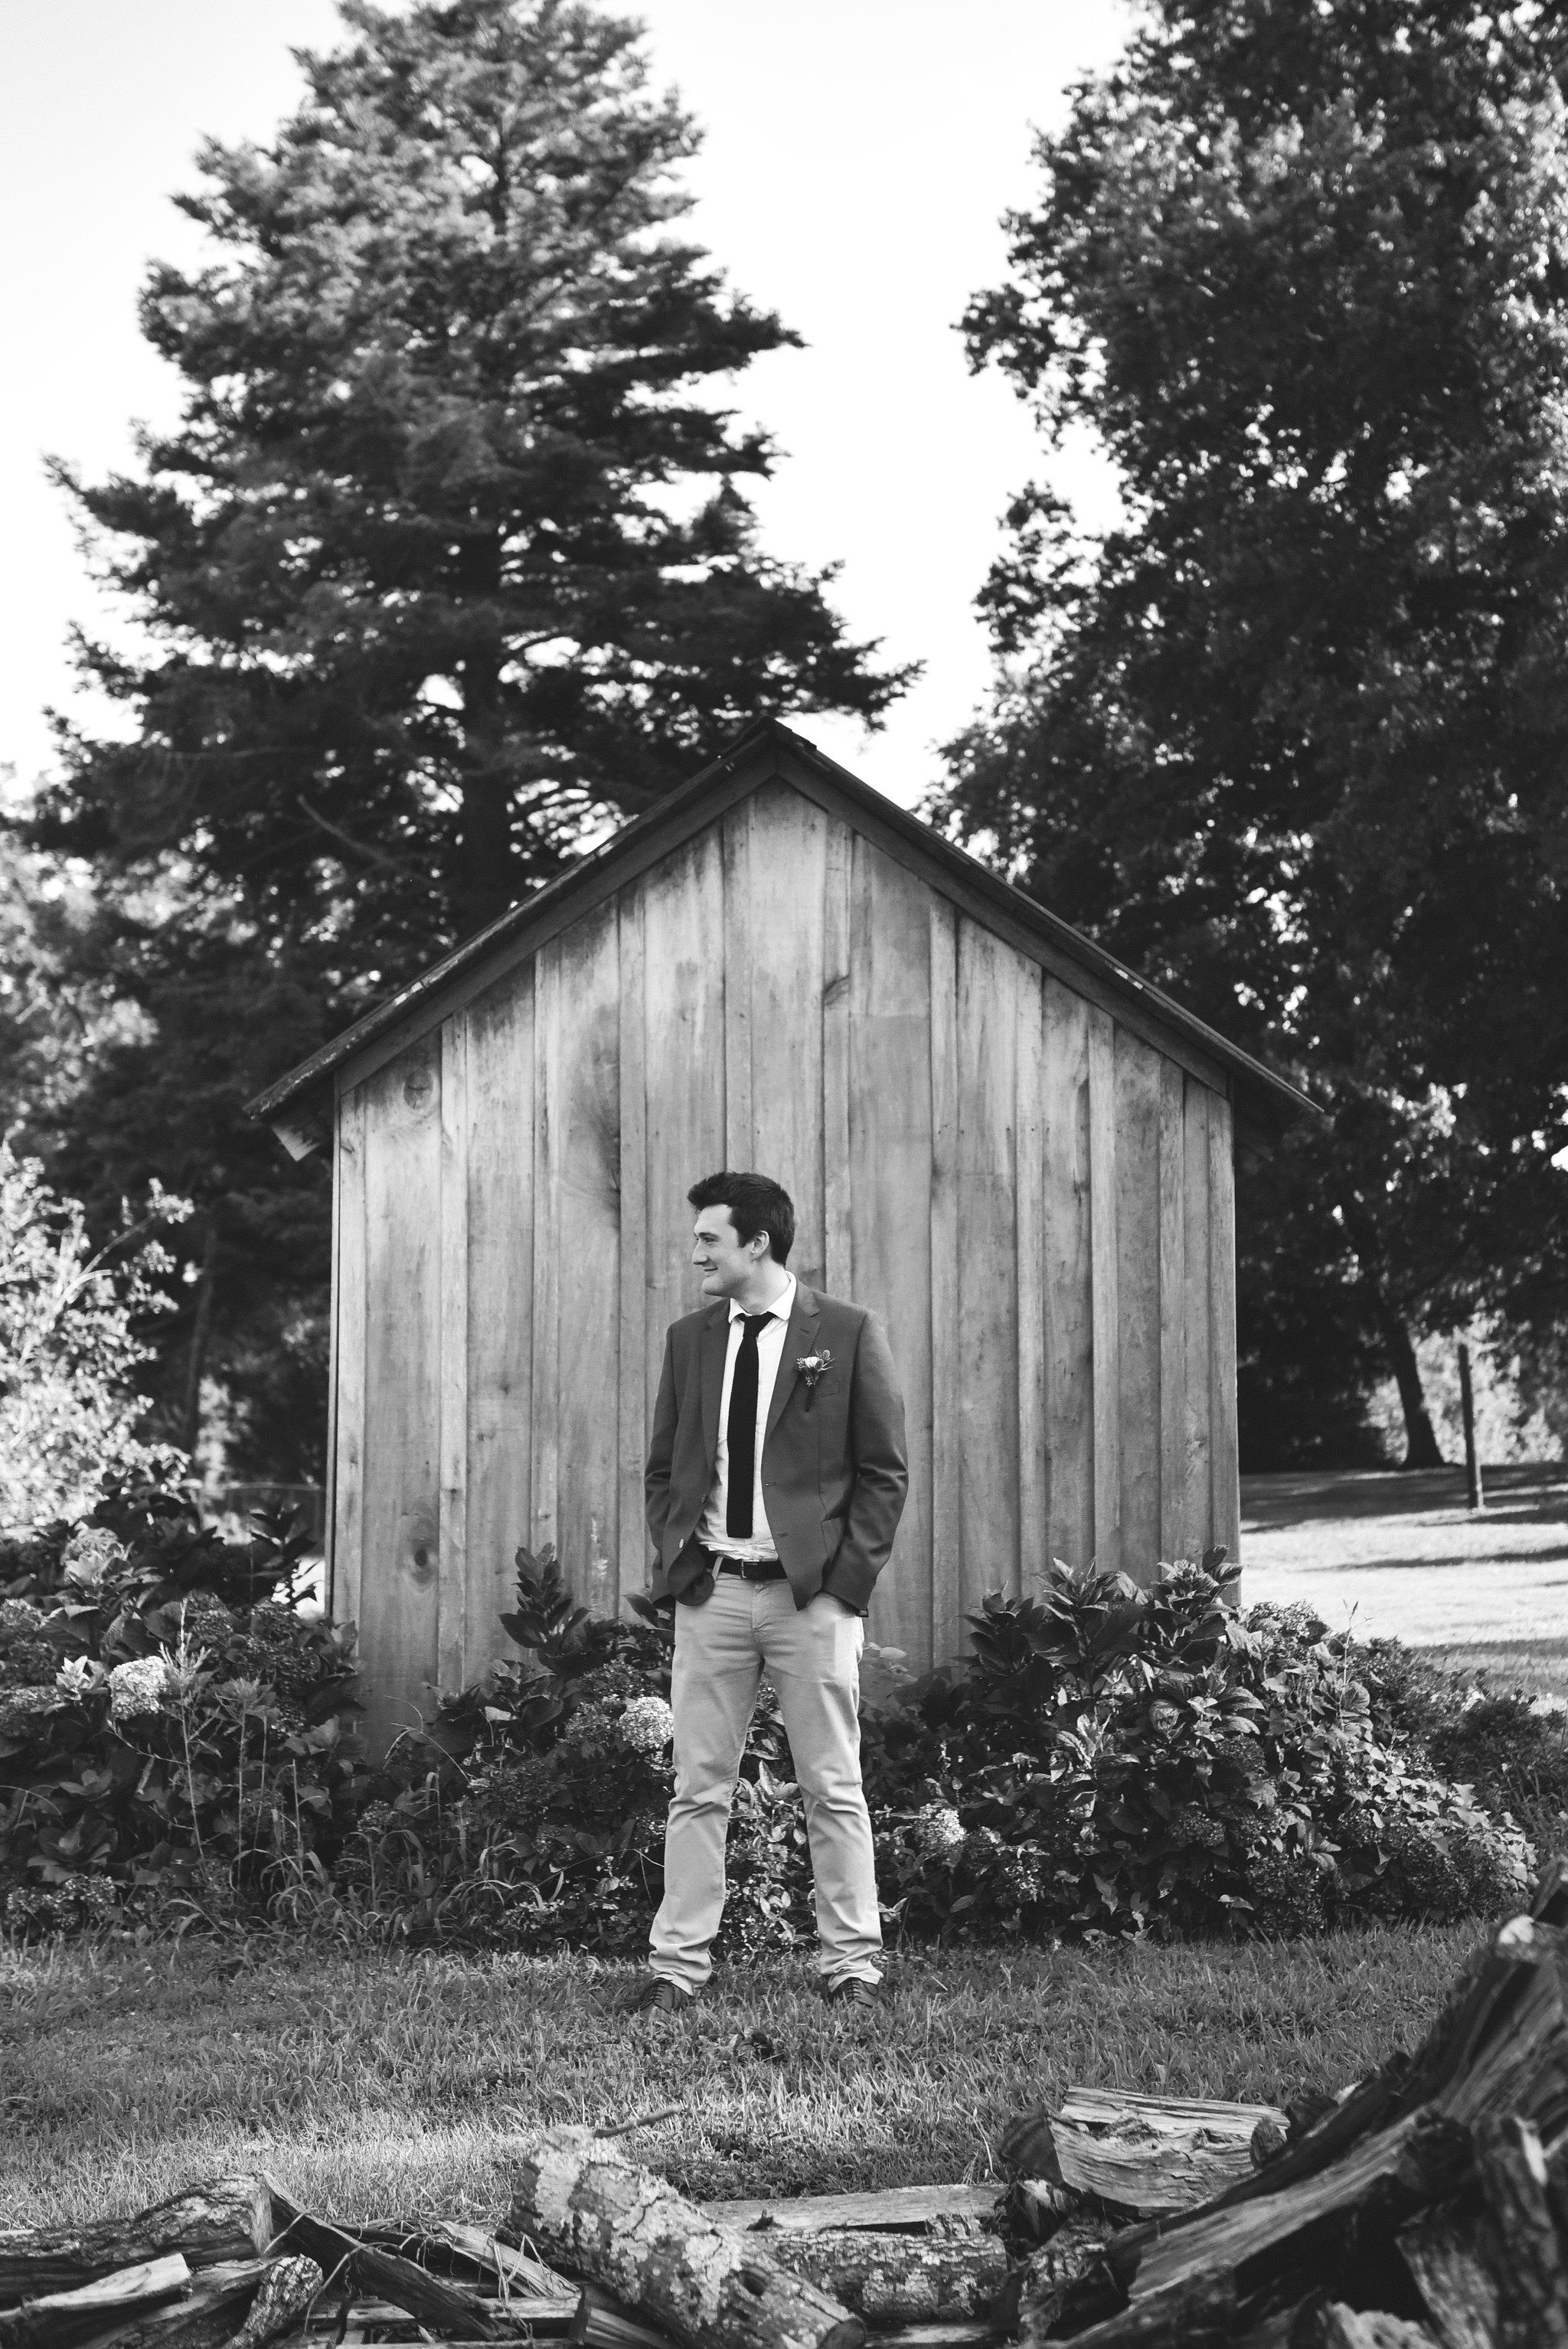 Maryland, Eastern Shore, Baltimore Wedding Photographer, Romantic, Boho, Backyard Wedding, Nature, Black and White Photo, Portrait of Groom Outside